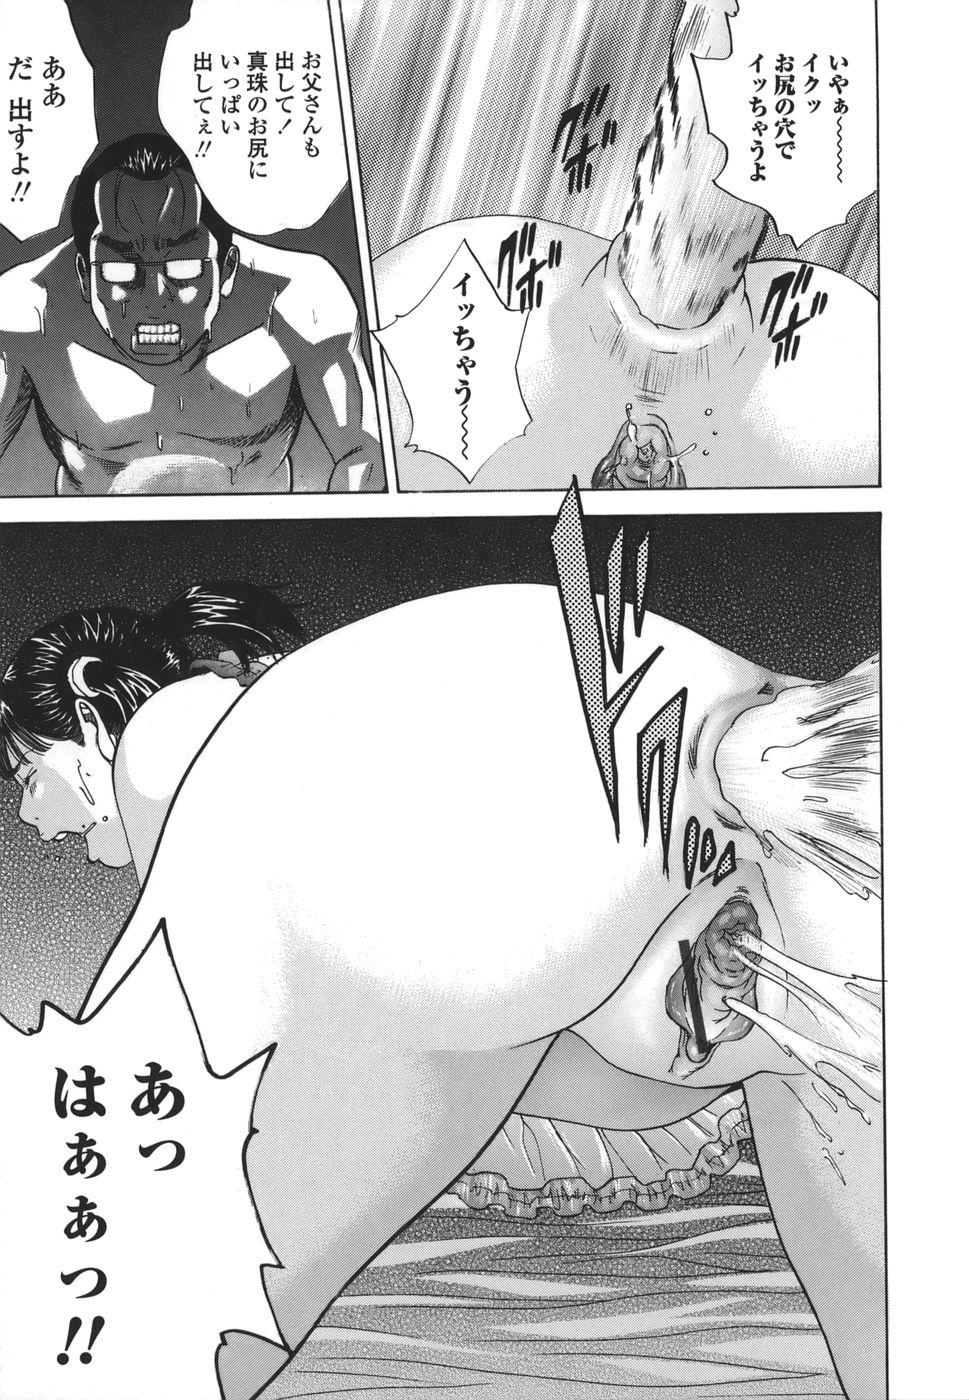 Kinshin Goukan - Near Relation Rapes 144